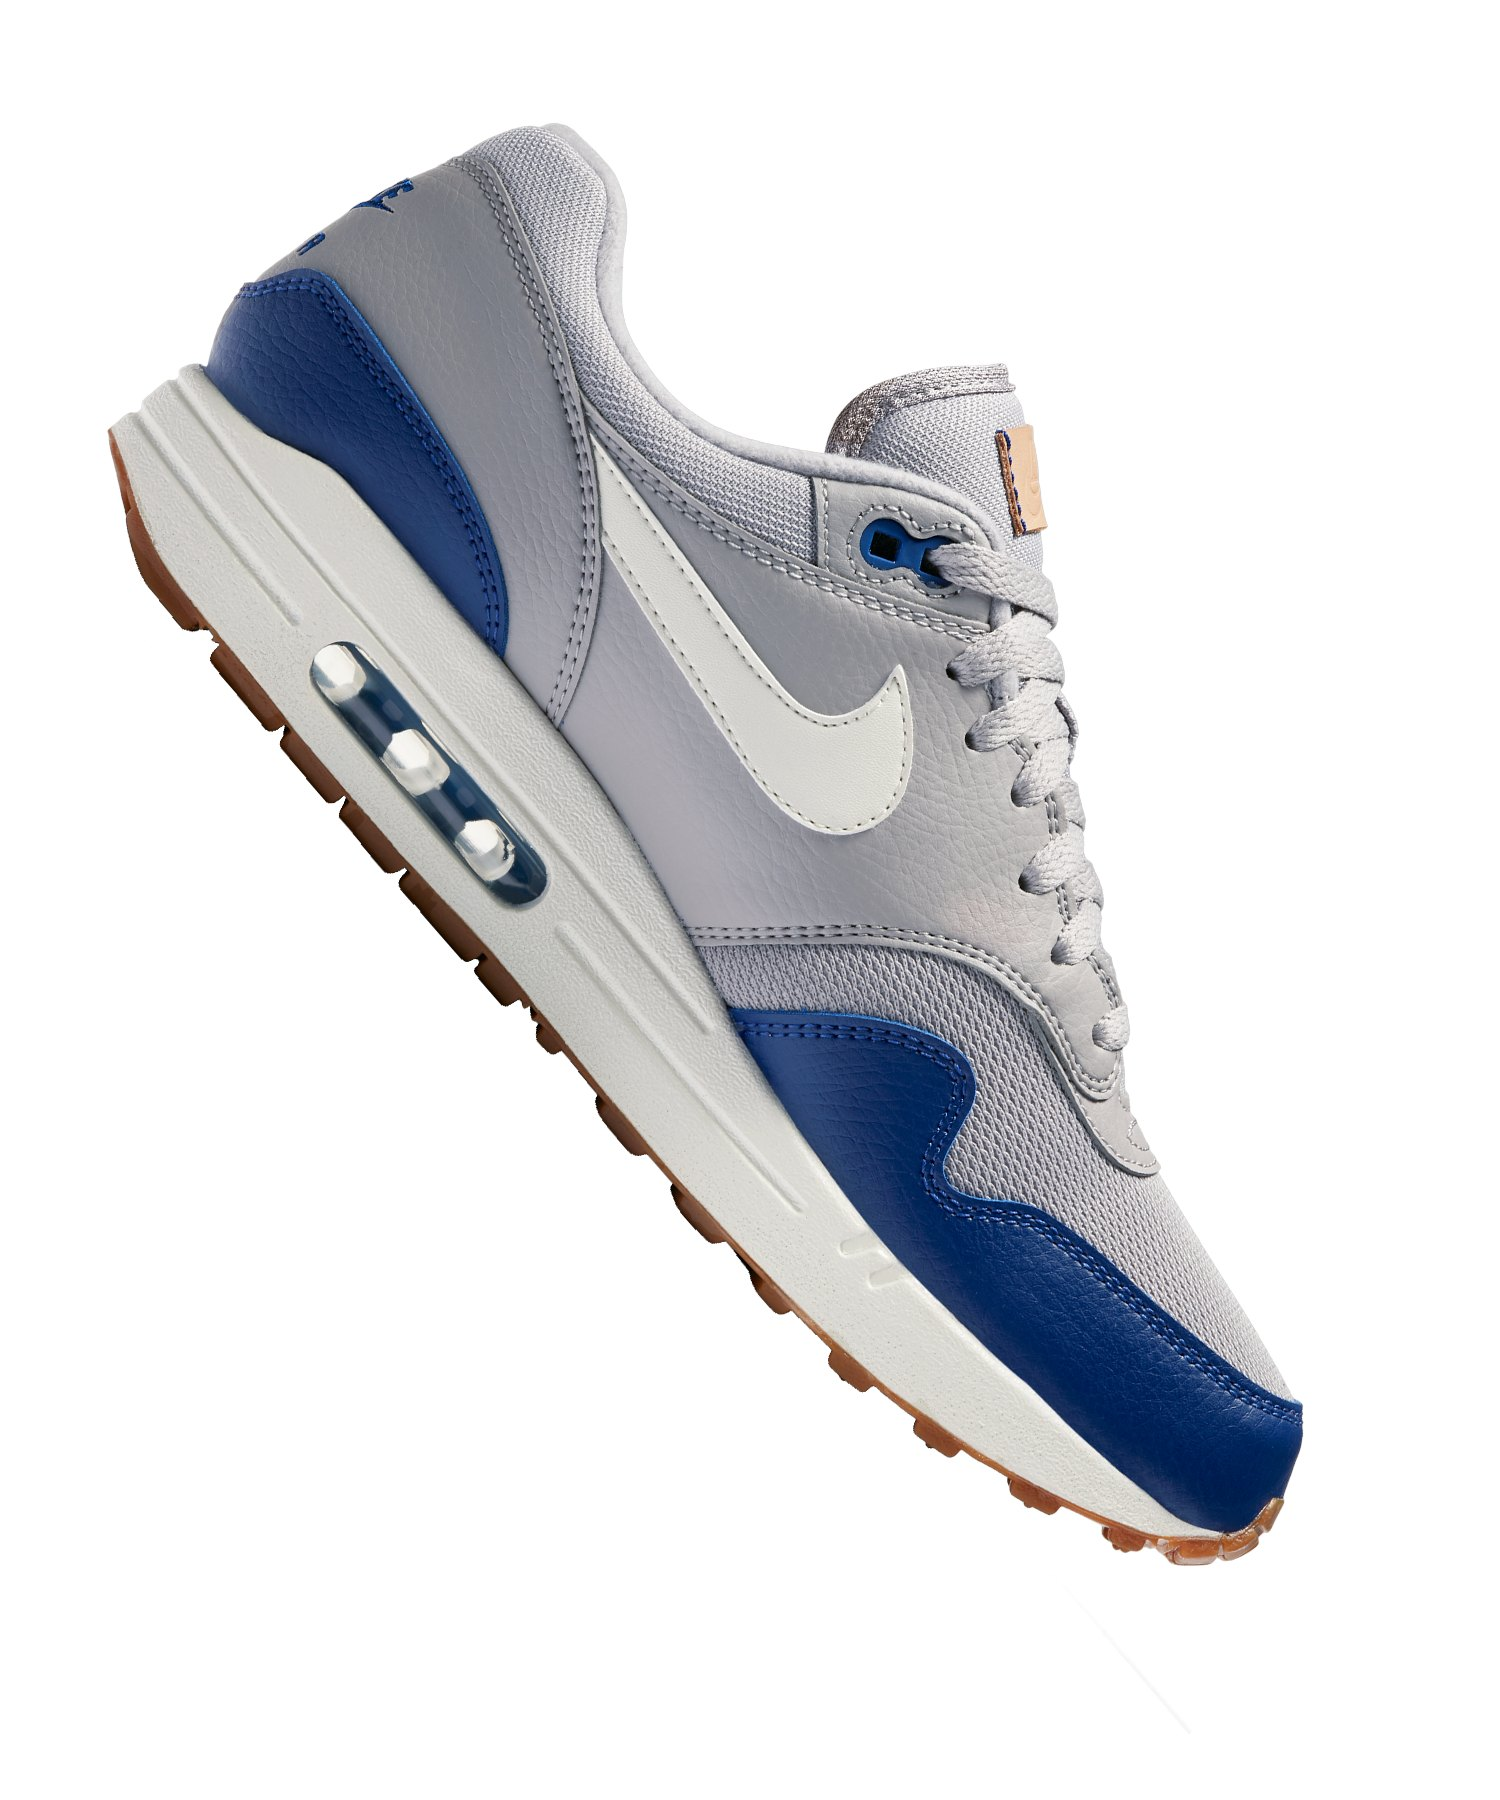 Nike Air Max Weiß 1 Schwarz Blau c43RjL5Aq